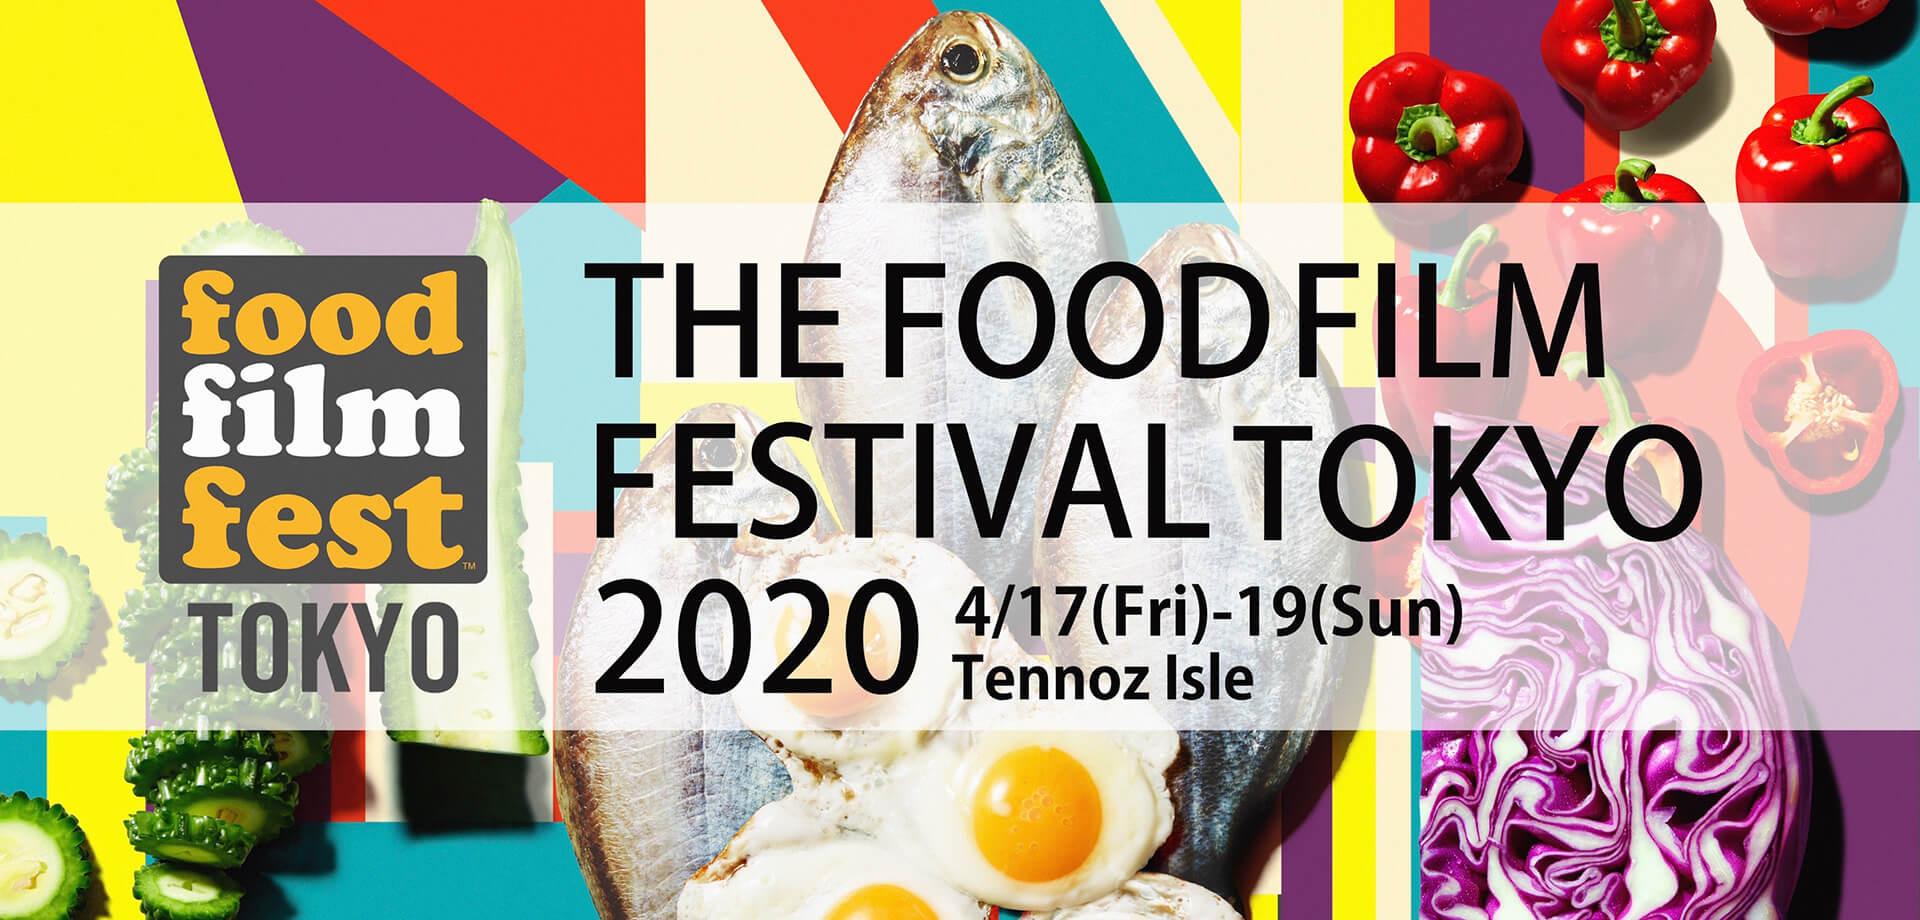 The Food Film Festival Tokyo 2020バナー